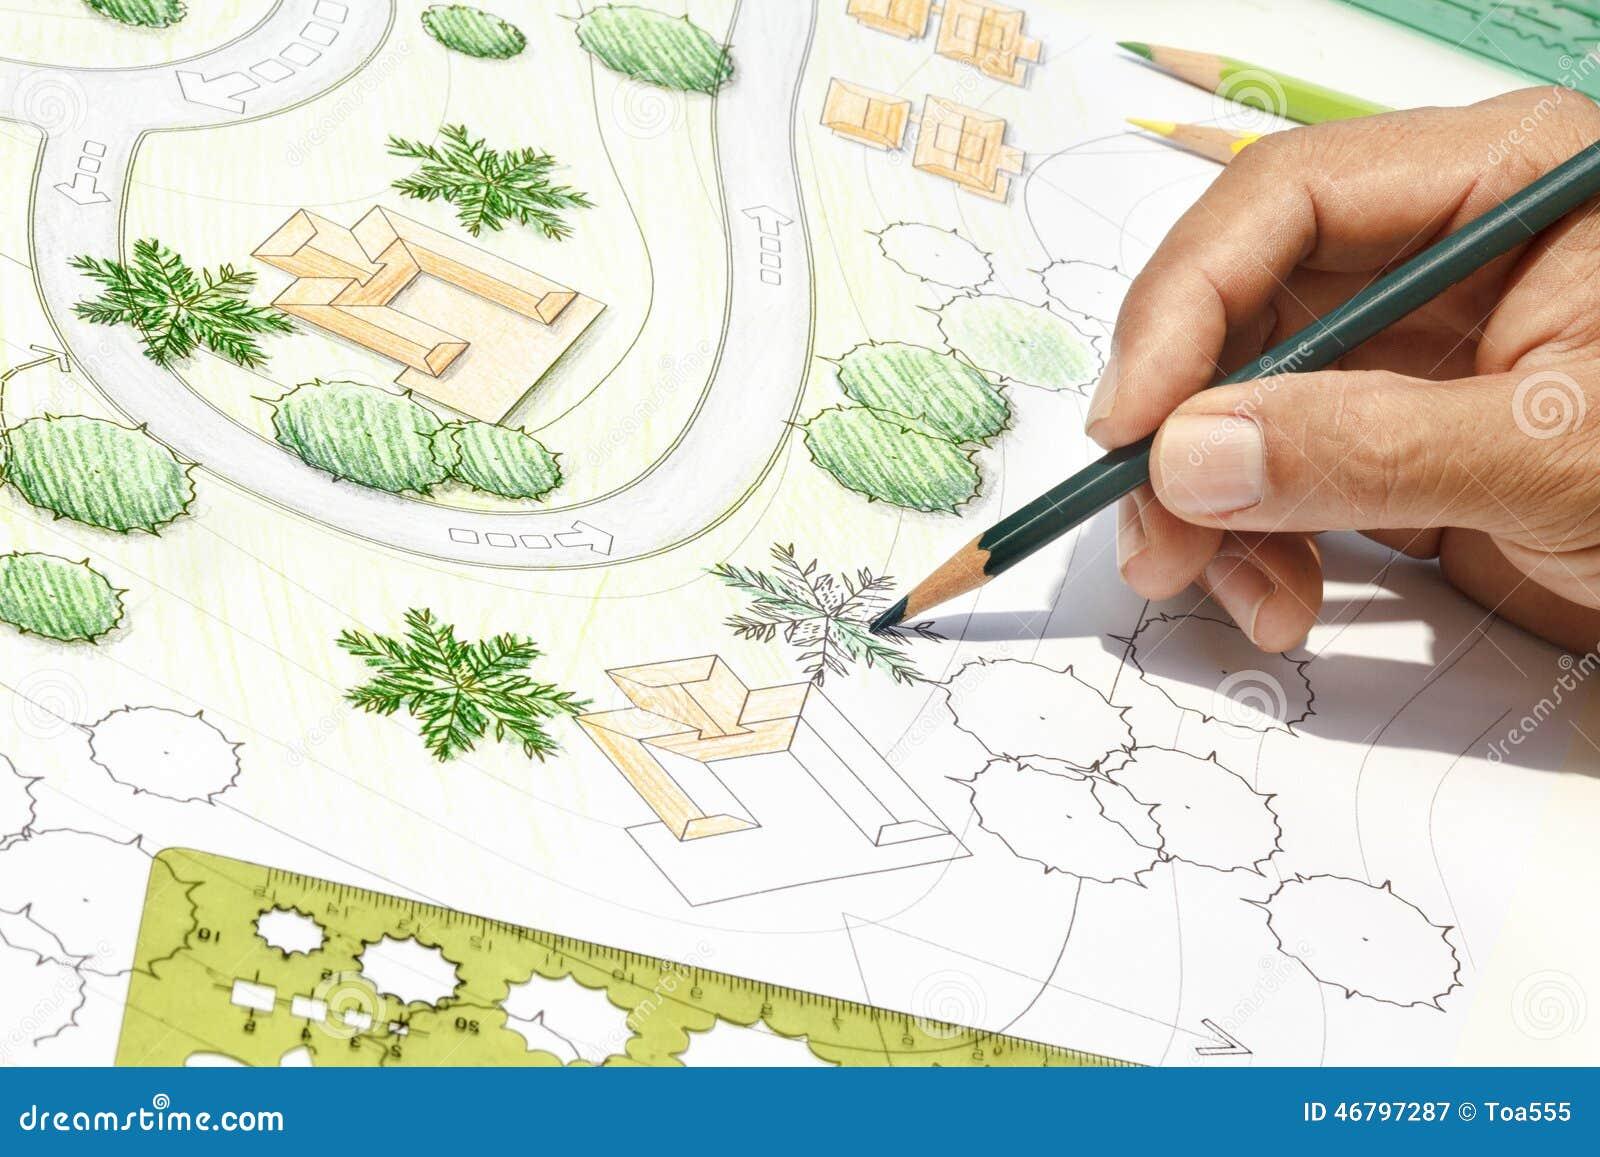 Landscape architect designing on site plan stock image for Site plans online